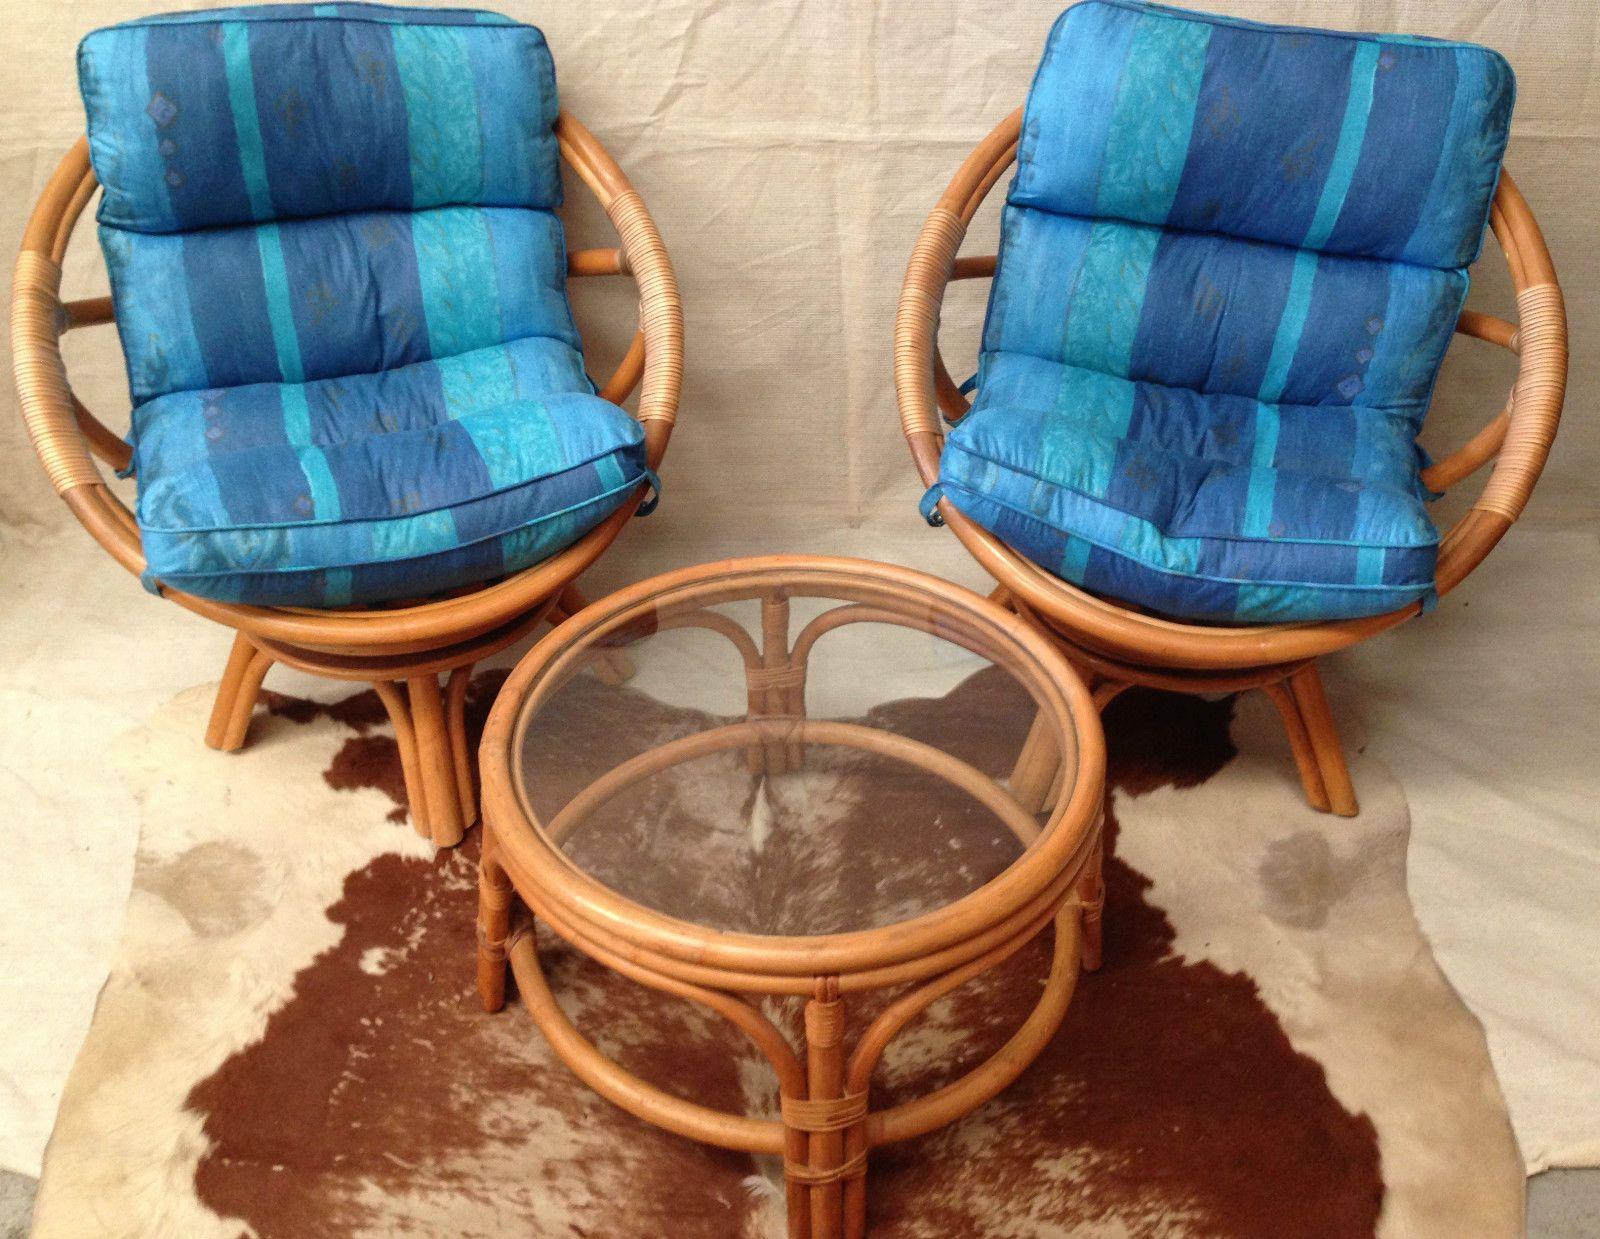 Swivel Chair Egg Cover Rental Orlando Fl Vintage Pair Bamboo Cane Tub Chairs W Cushions